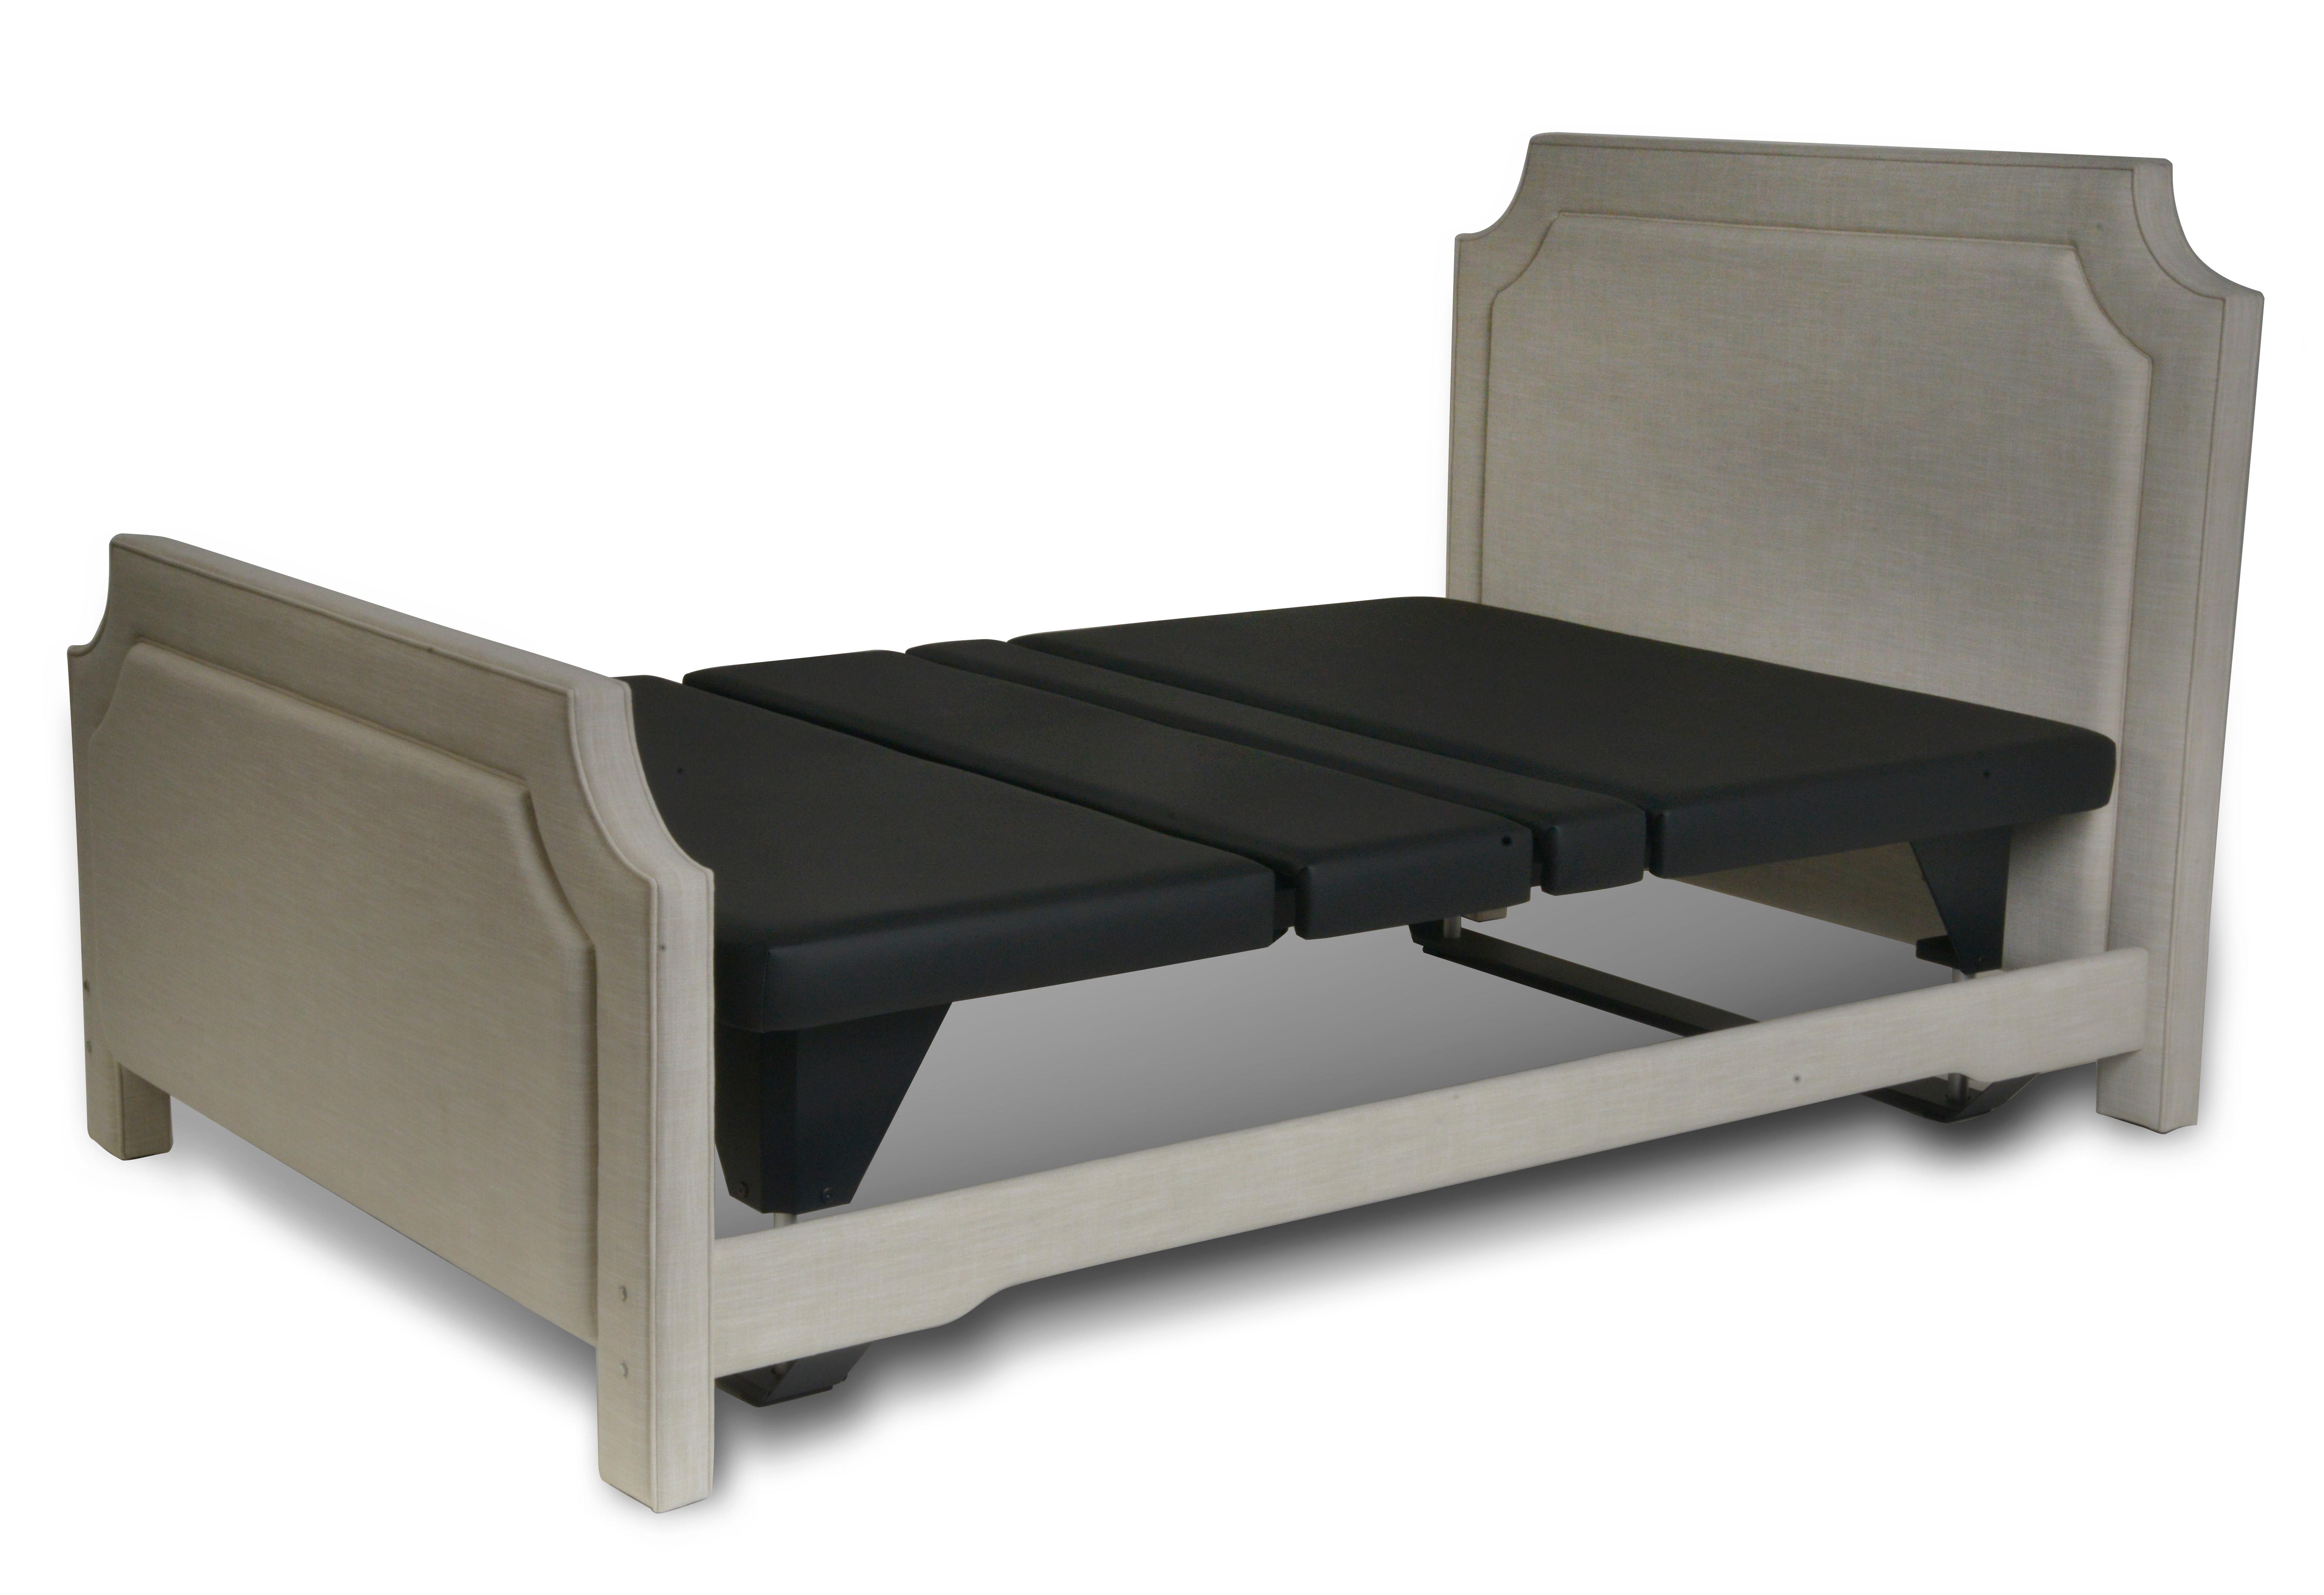 Assured Comfort Hi Low Adjustable Bed Signature Fabric - Up Position